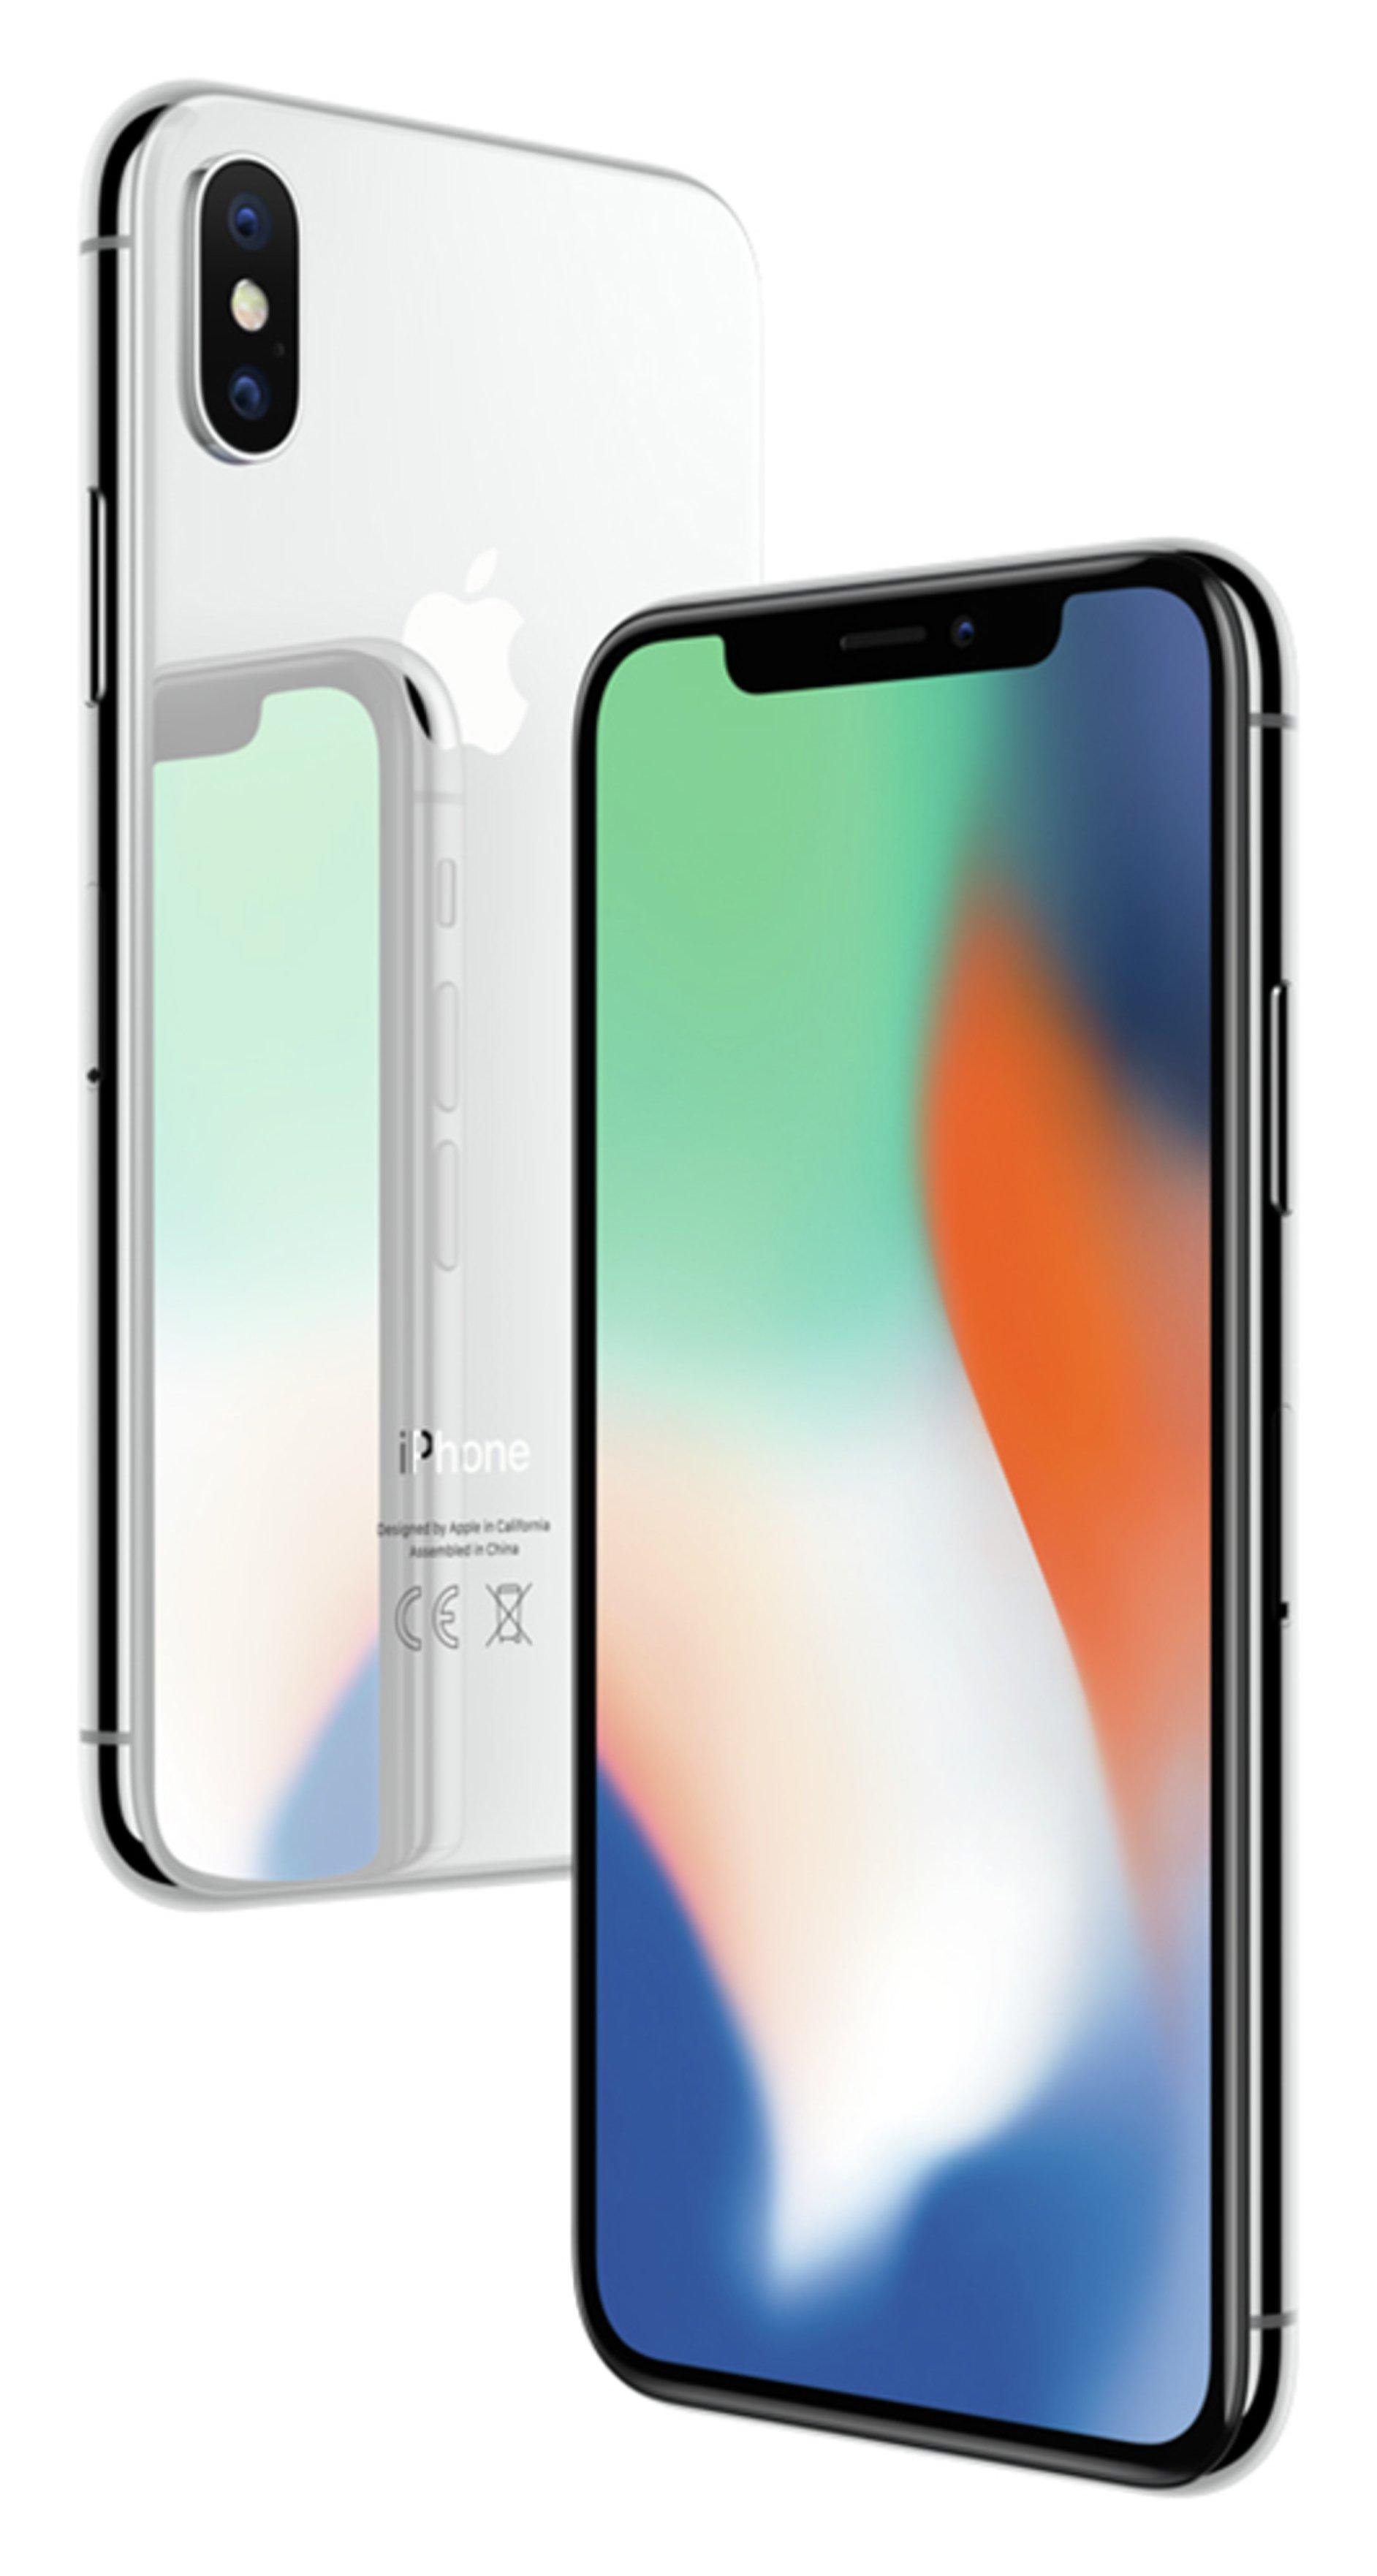 Apple Sim Free iPhone X 256GB Mobile Phone - Silver